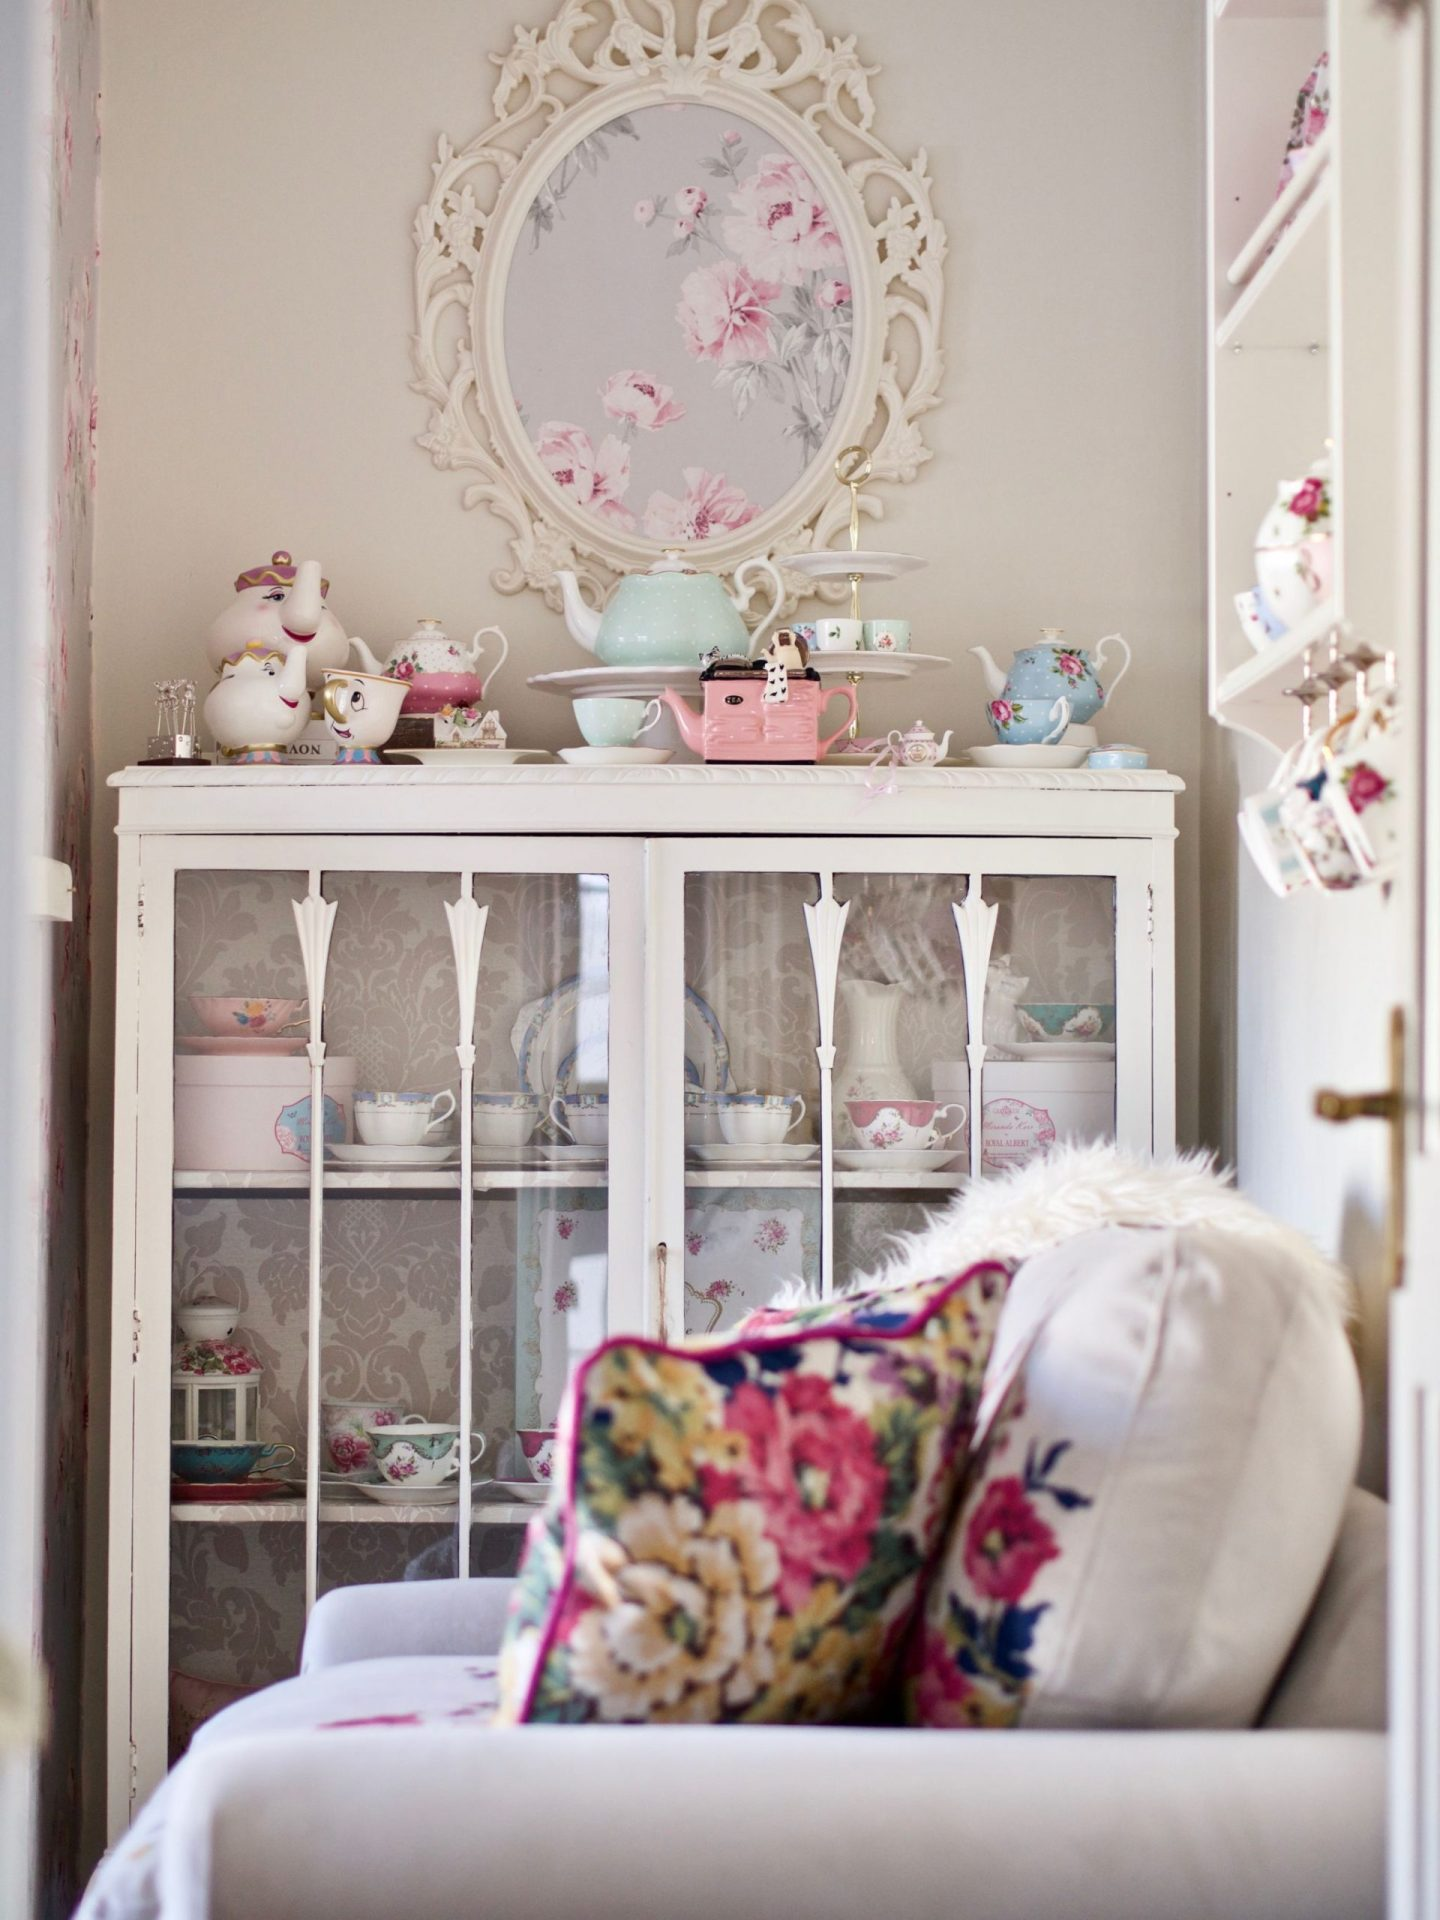 Living room decor, cottage style shabby chic decor